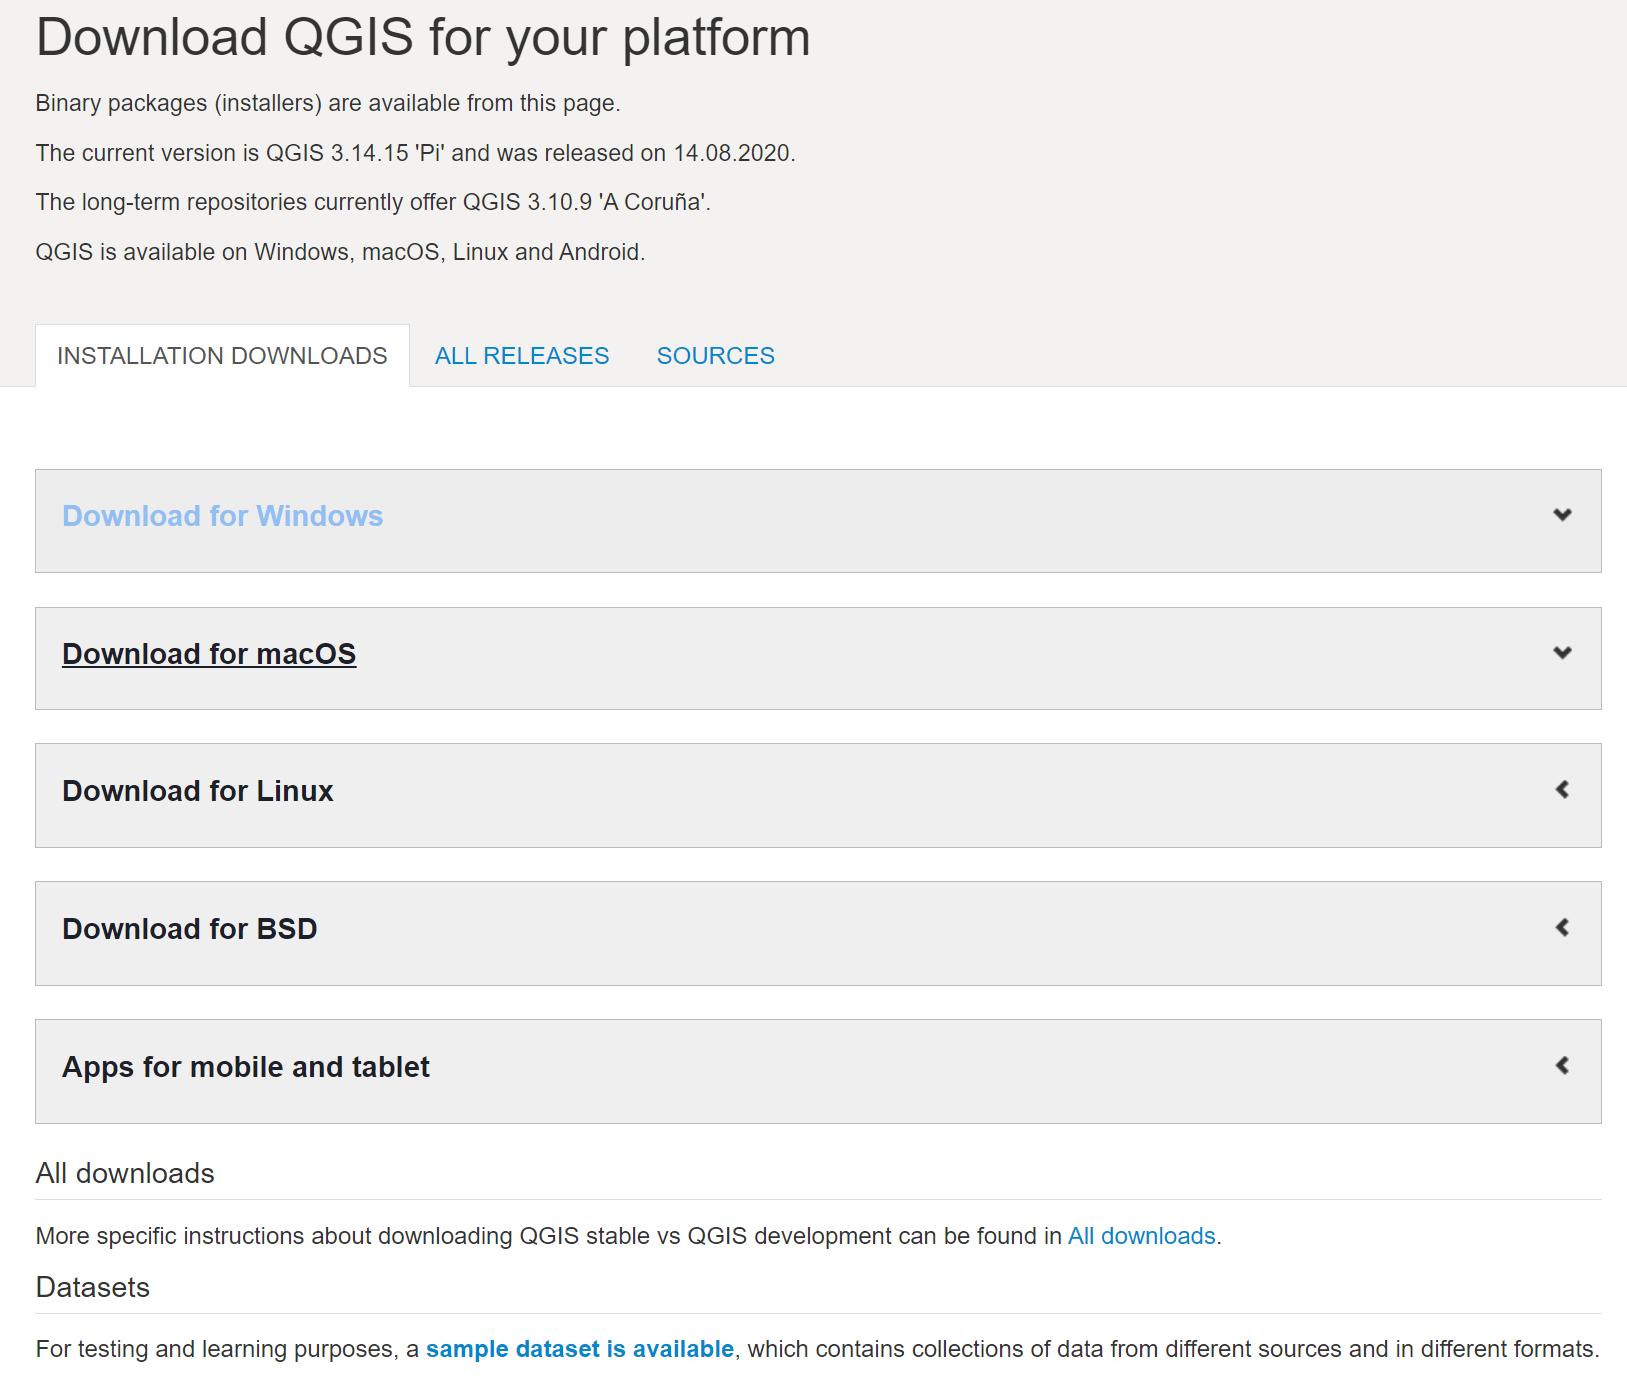 QGIS Downloads